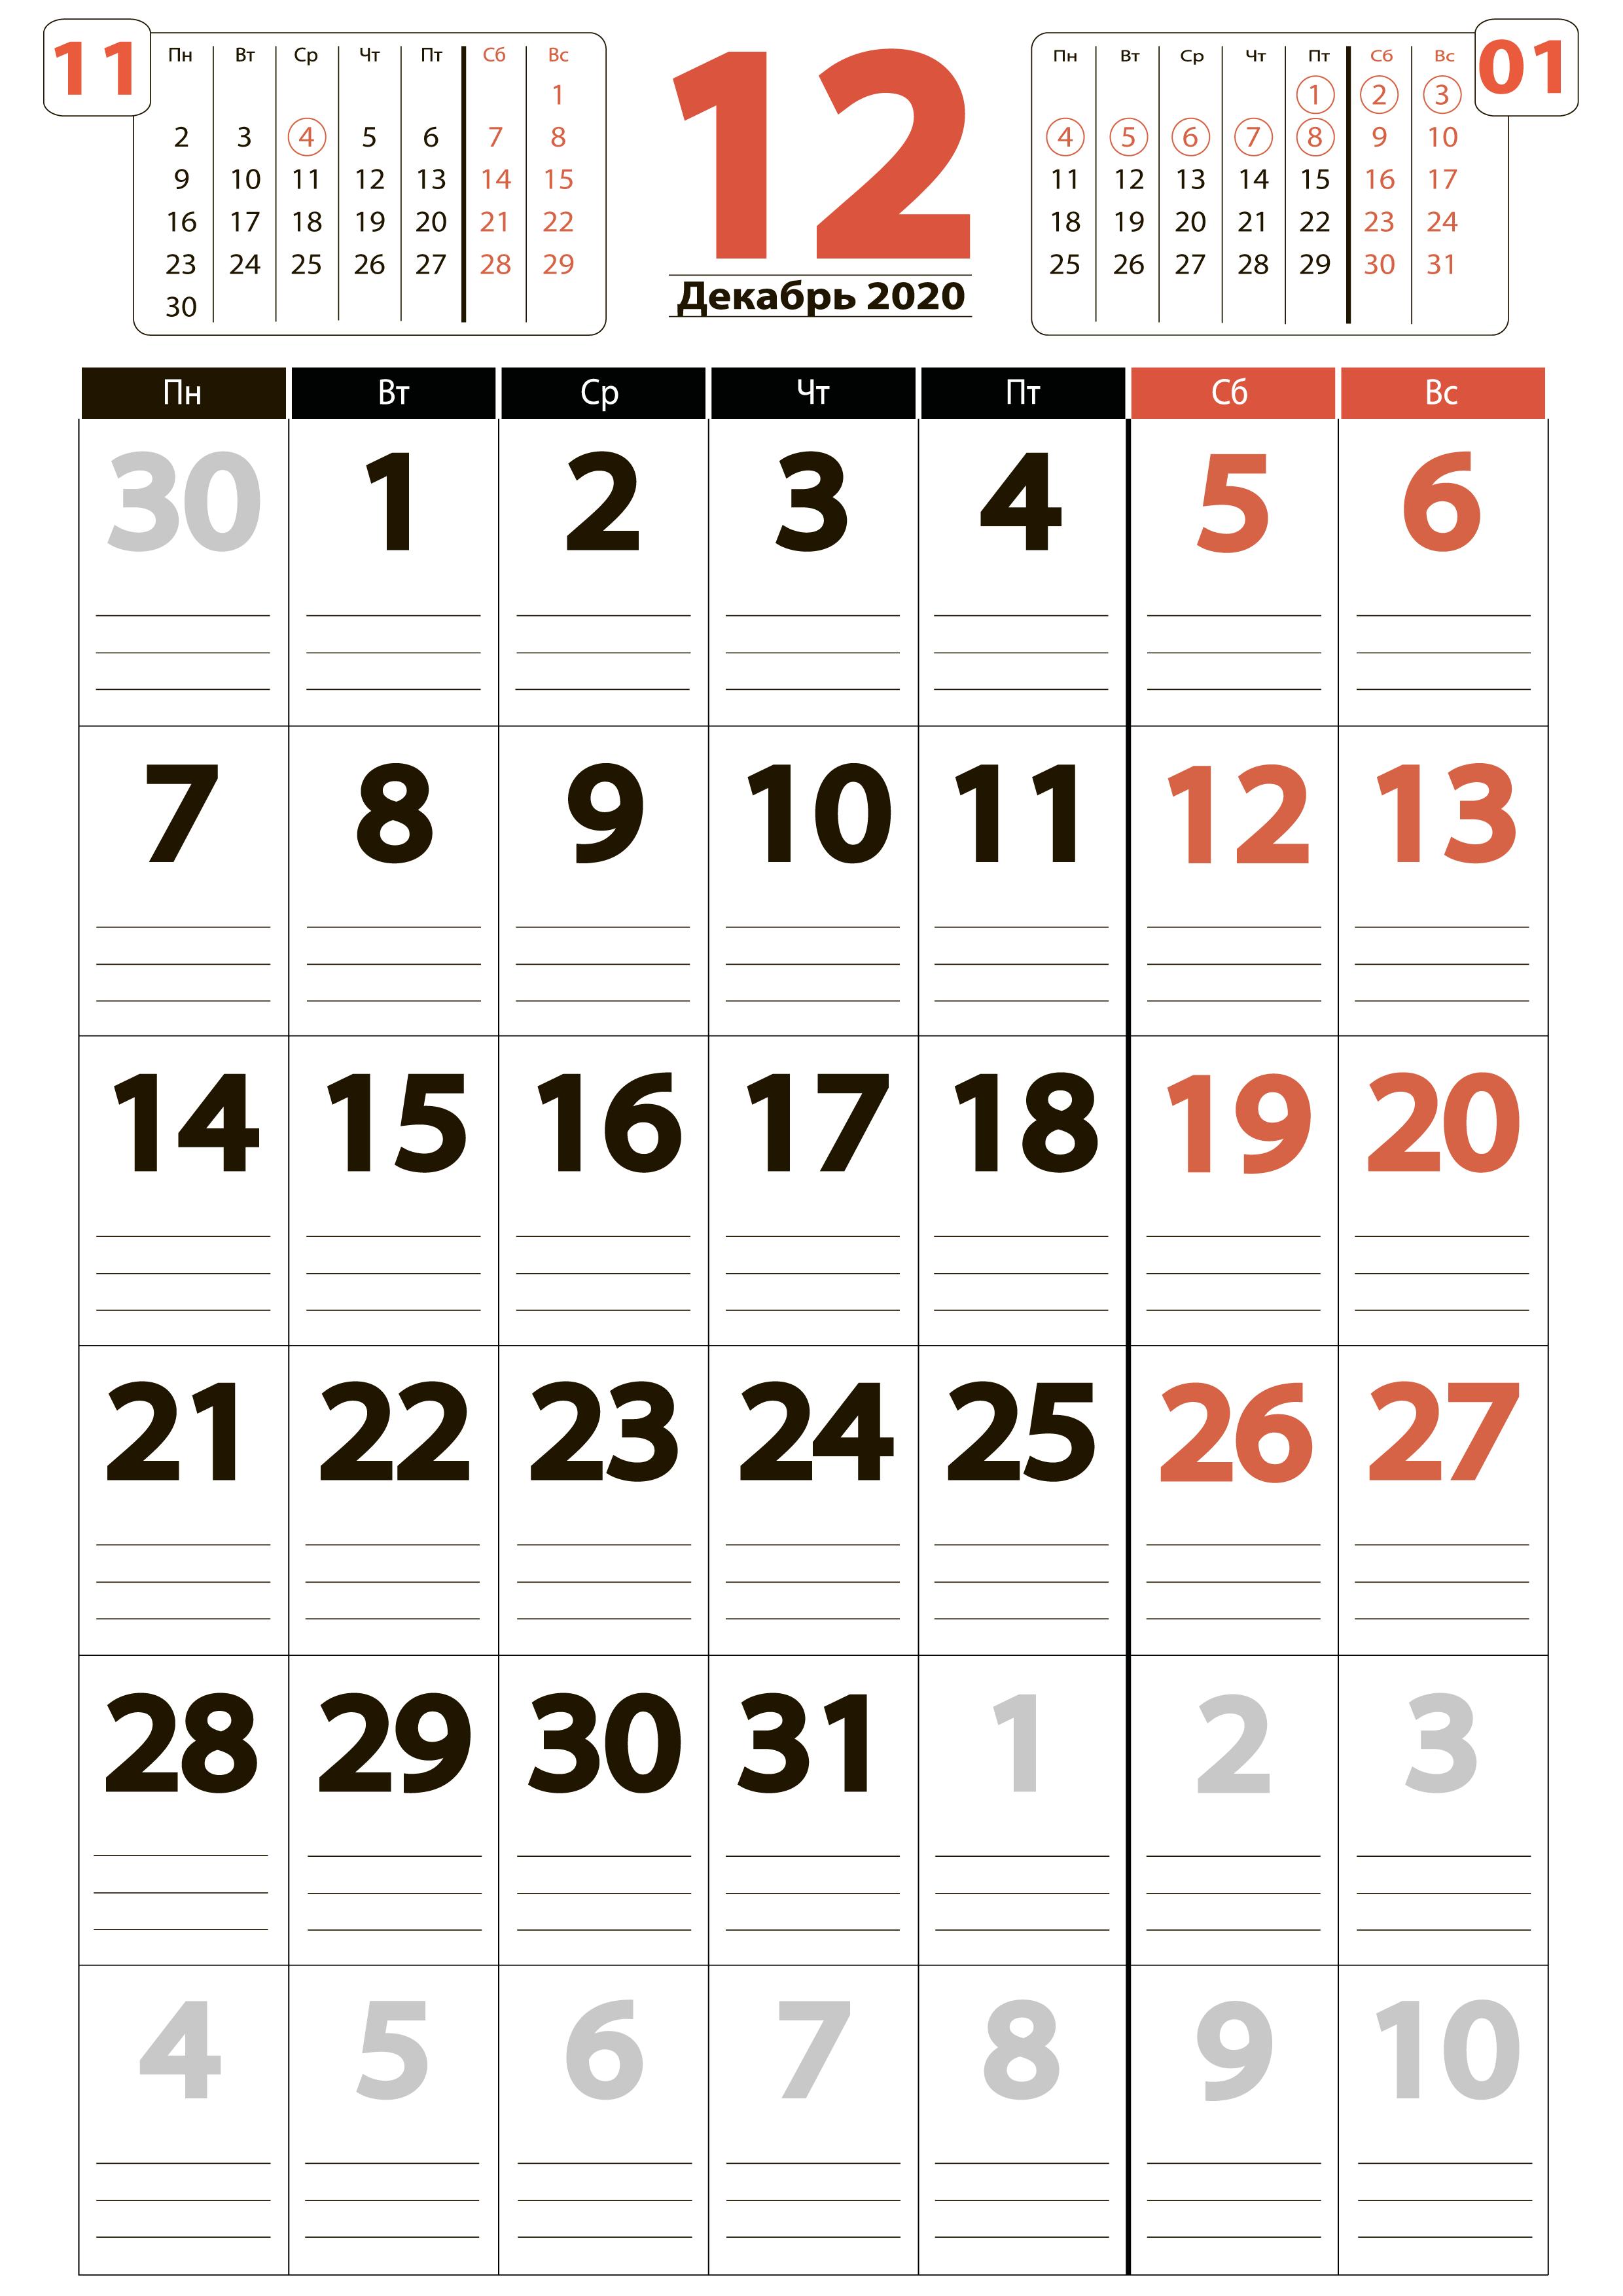 Декабрь 2020 - Крупный календарь на месяц